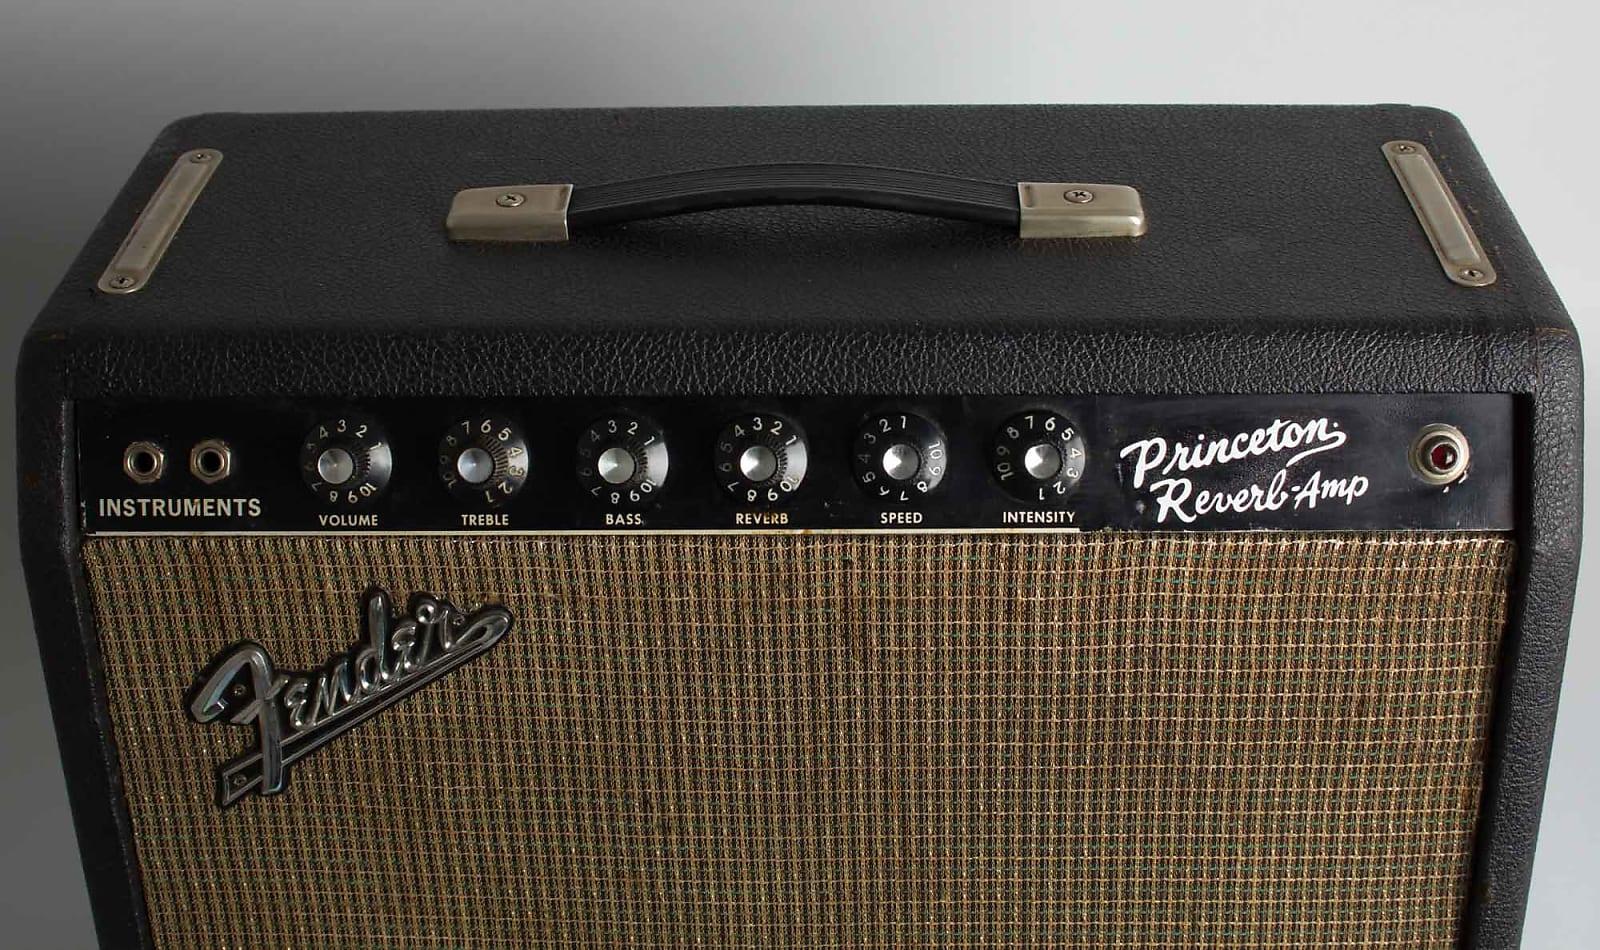 Fender  Princeton Reverb Tube Amplifier (1966), ser. #A-13665.